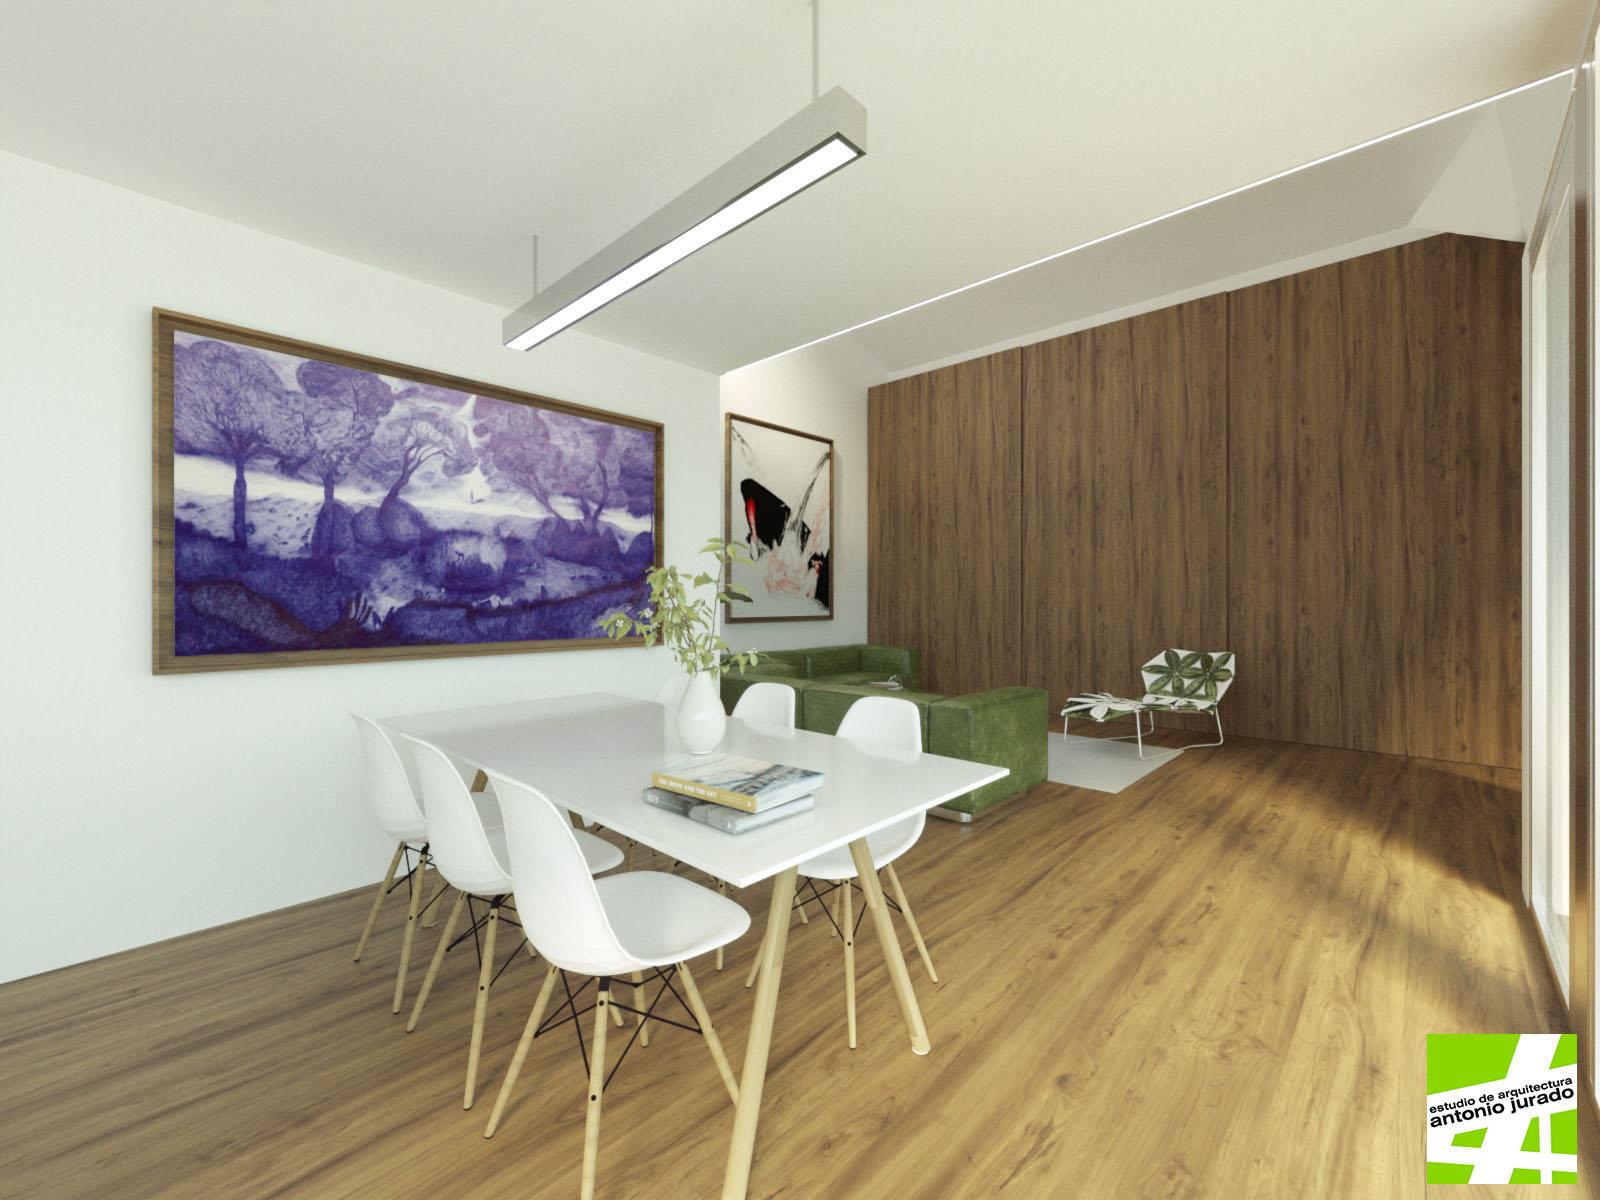 casa-ob-house-alhaurin-malaga-arquitecto-antonio-jurado-08